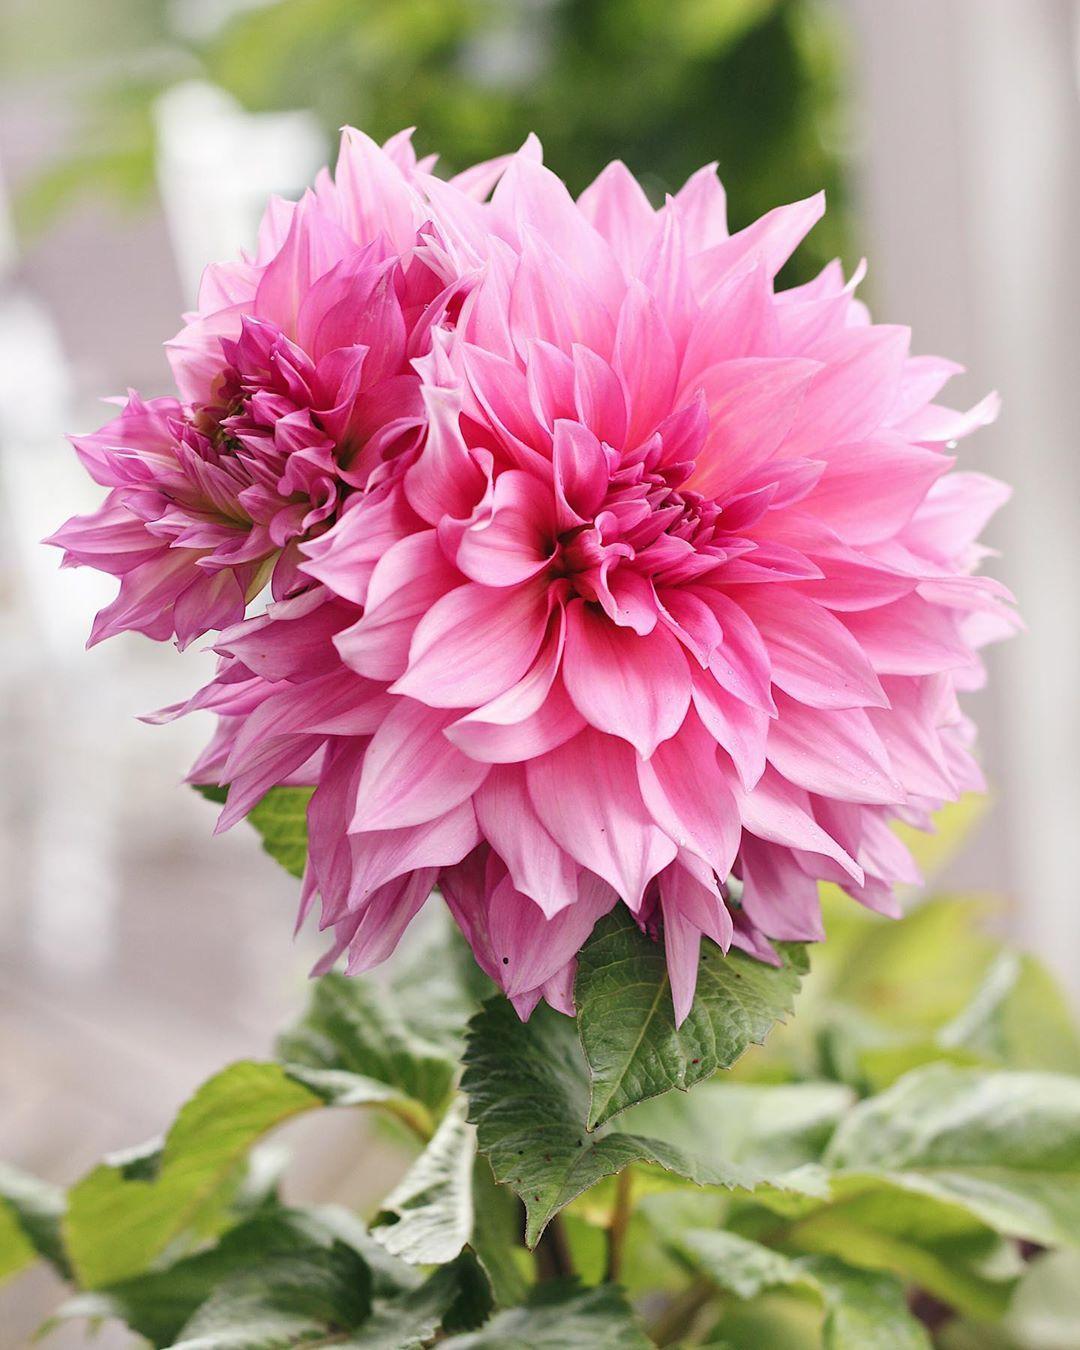 Knallrosa Cafe Au Lait Rose Cafeaulait Dahlia Trädgård Garden Blommor Flowers Flowerlover Puutarhankukat Instagarden Höst P Flowers Plants Rose